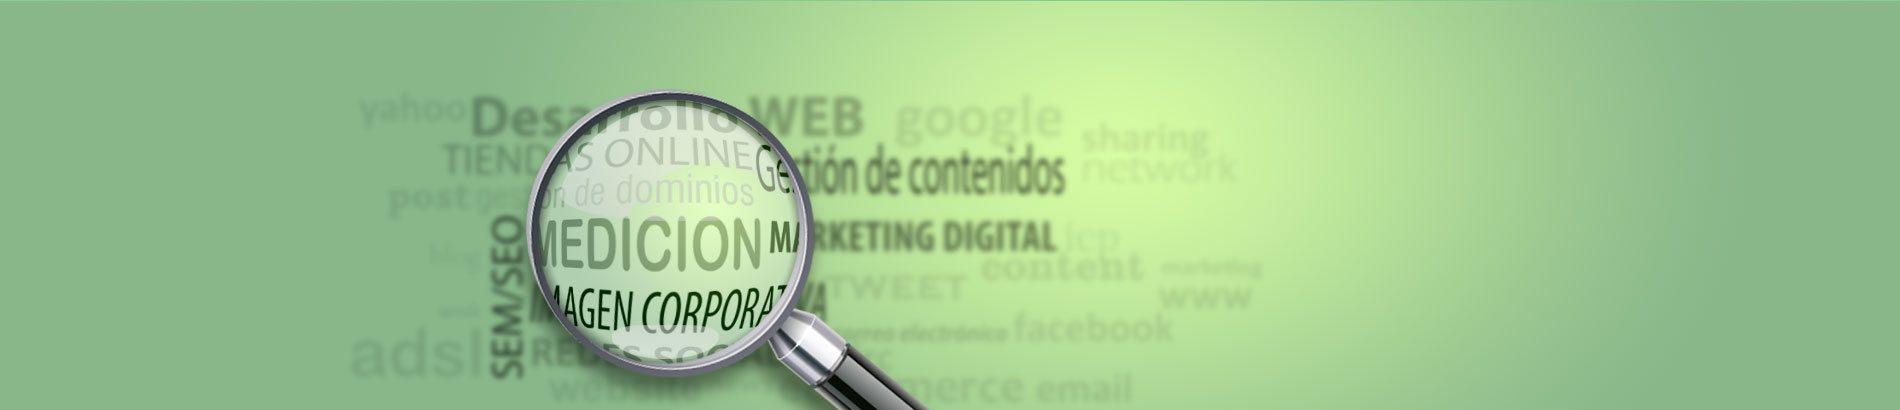 tecnologia-digital